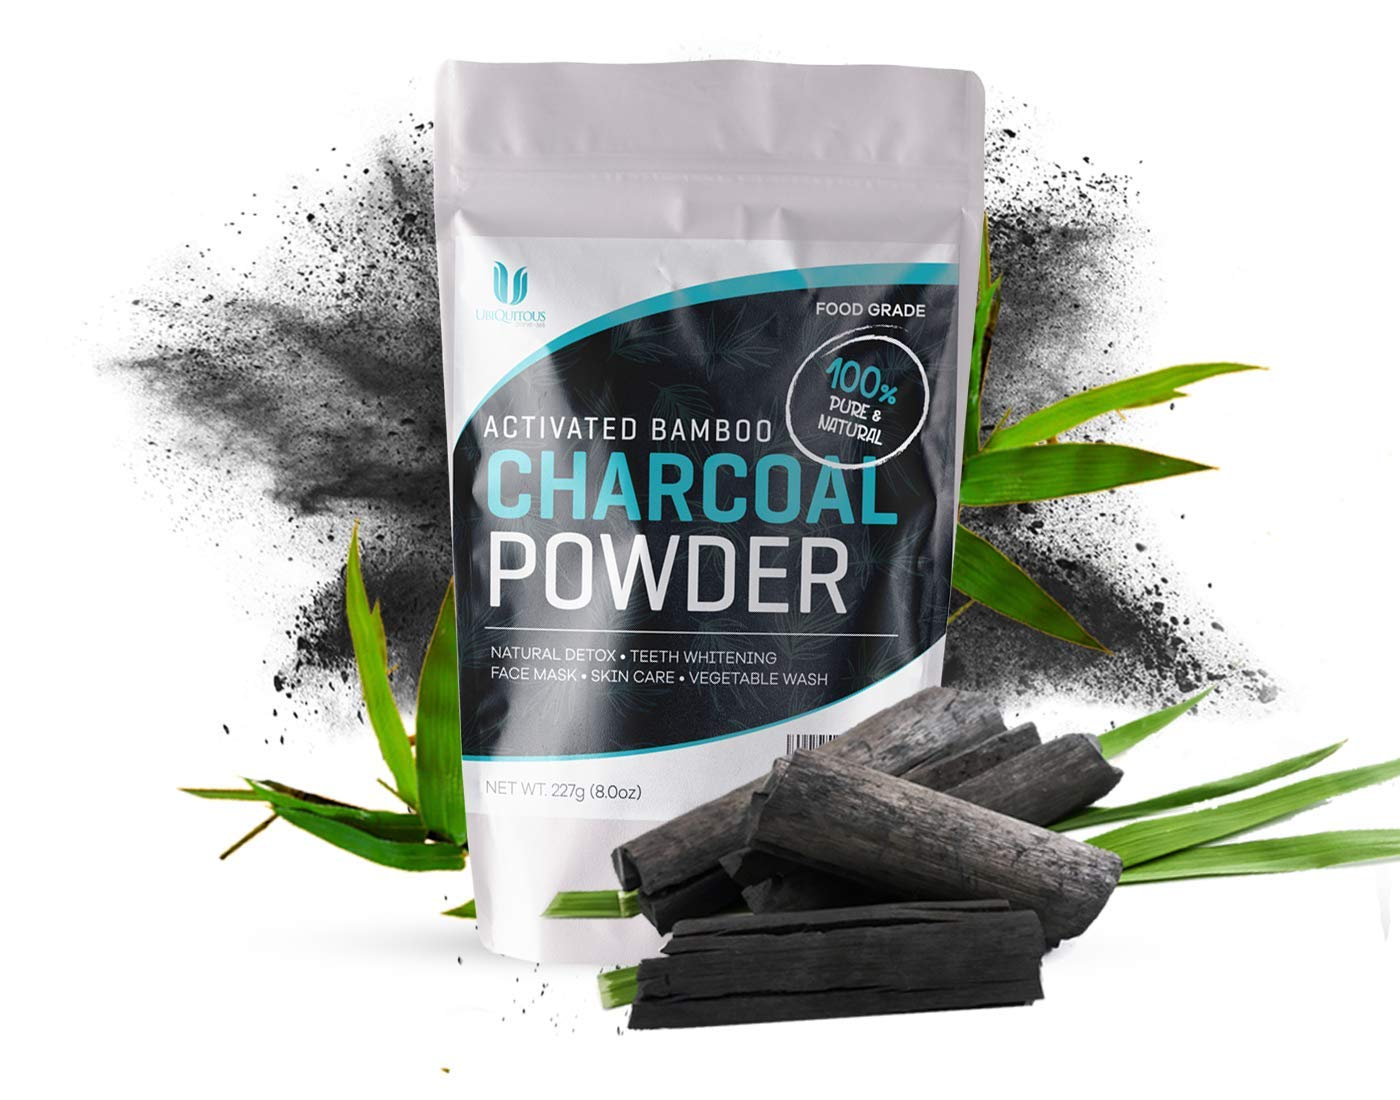 Activated Bamboo Charcoal Powder, Food Grade, Active Charcoal for Teeth Whitening, Baking, Soap Making. Big Bulk Bag Charcoal Powder. Zone – 365